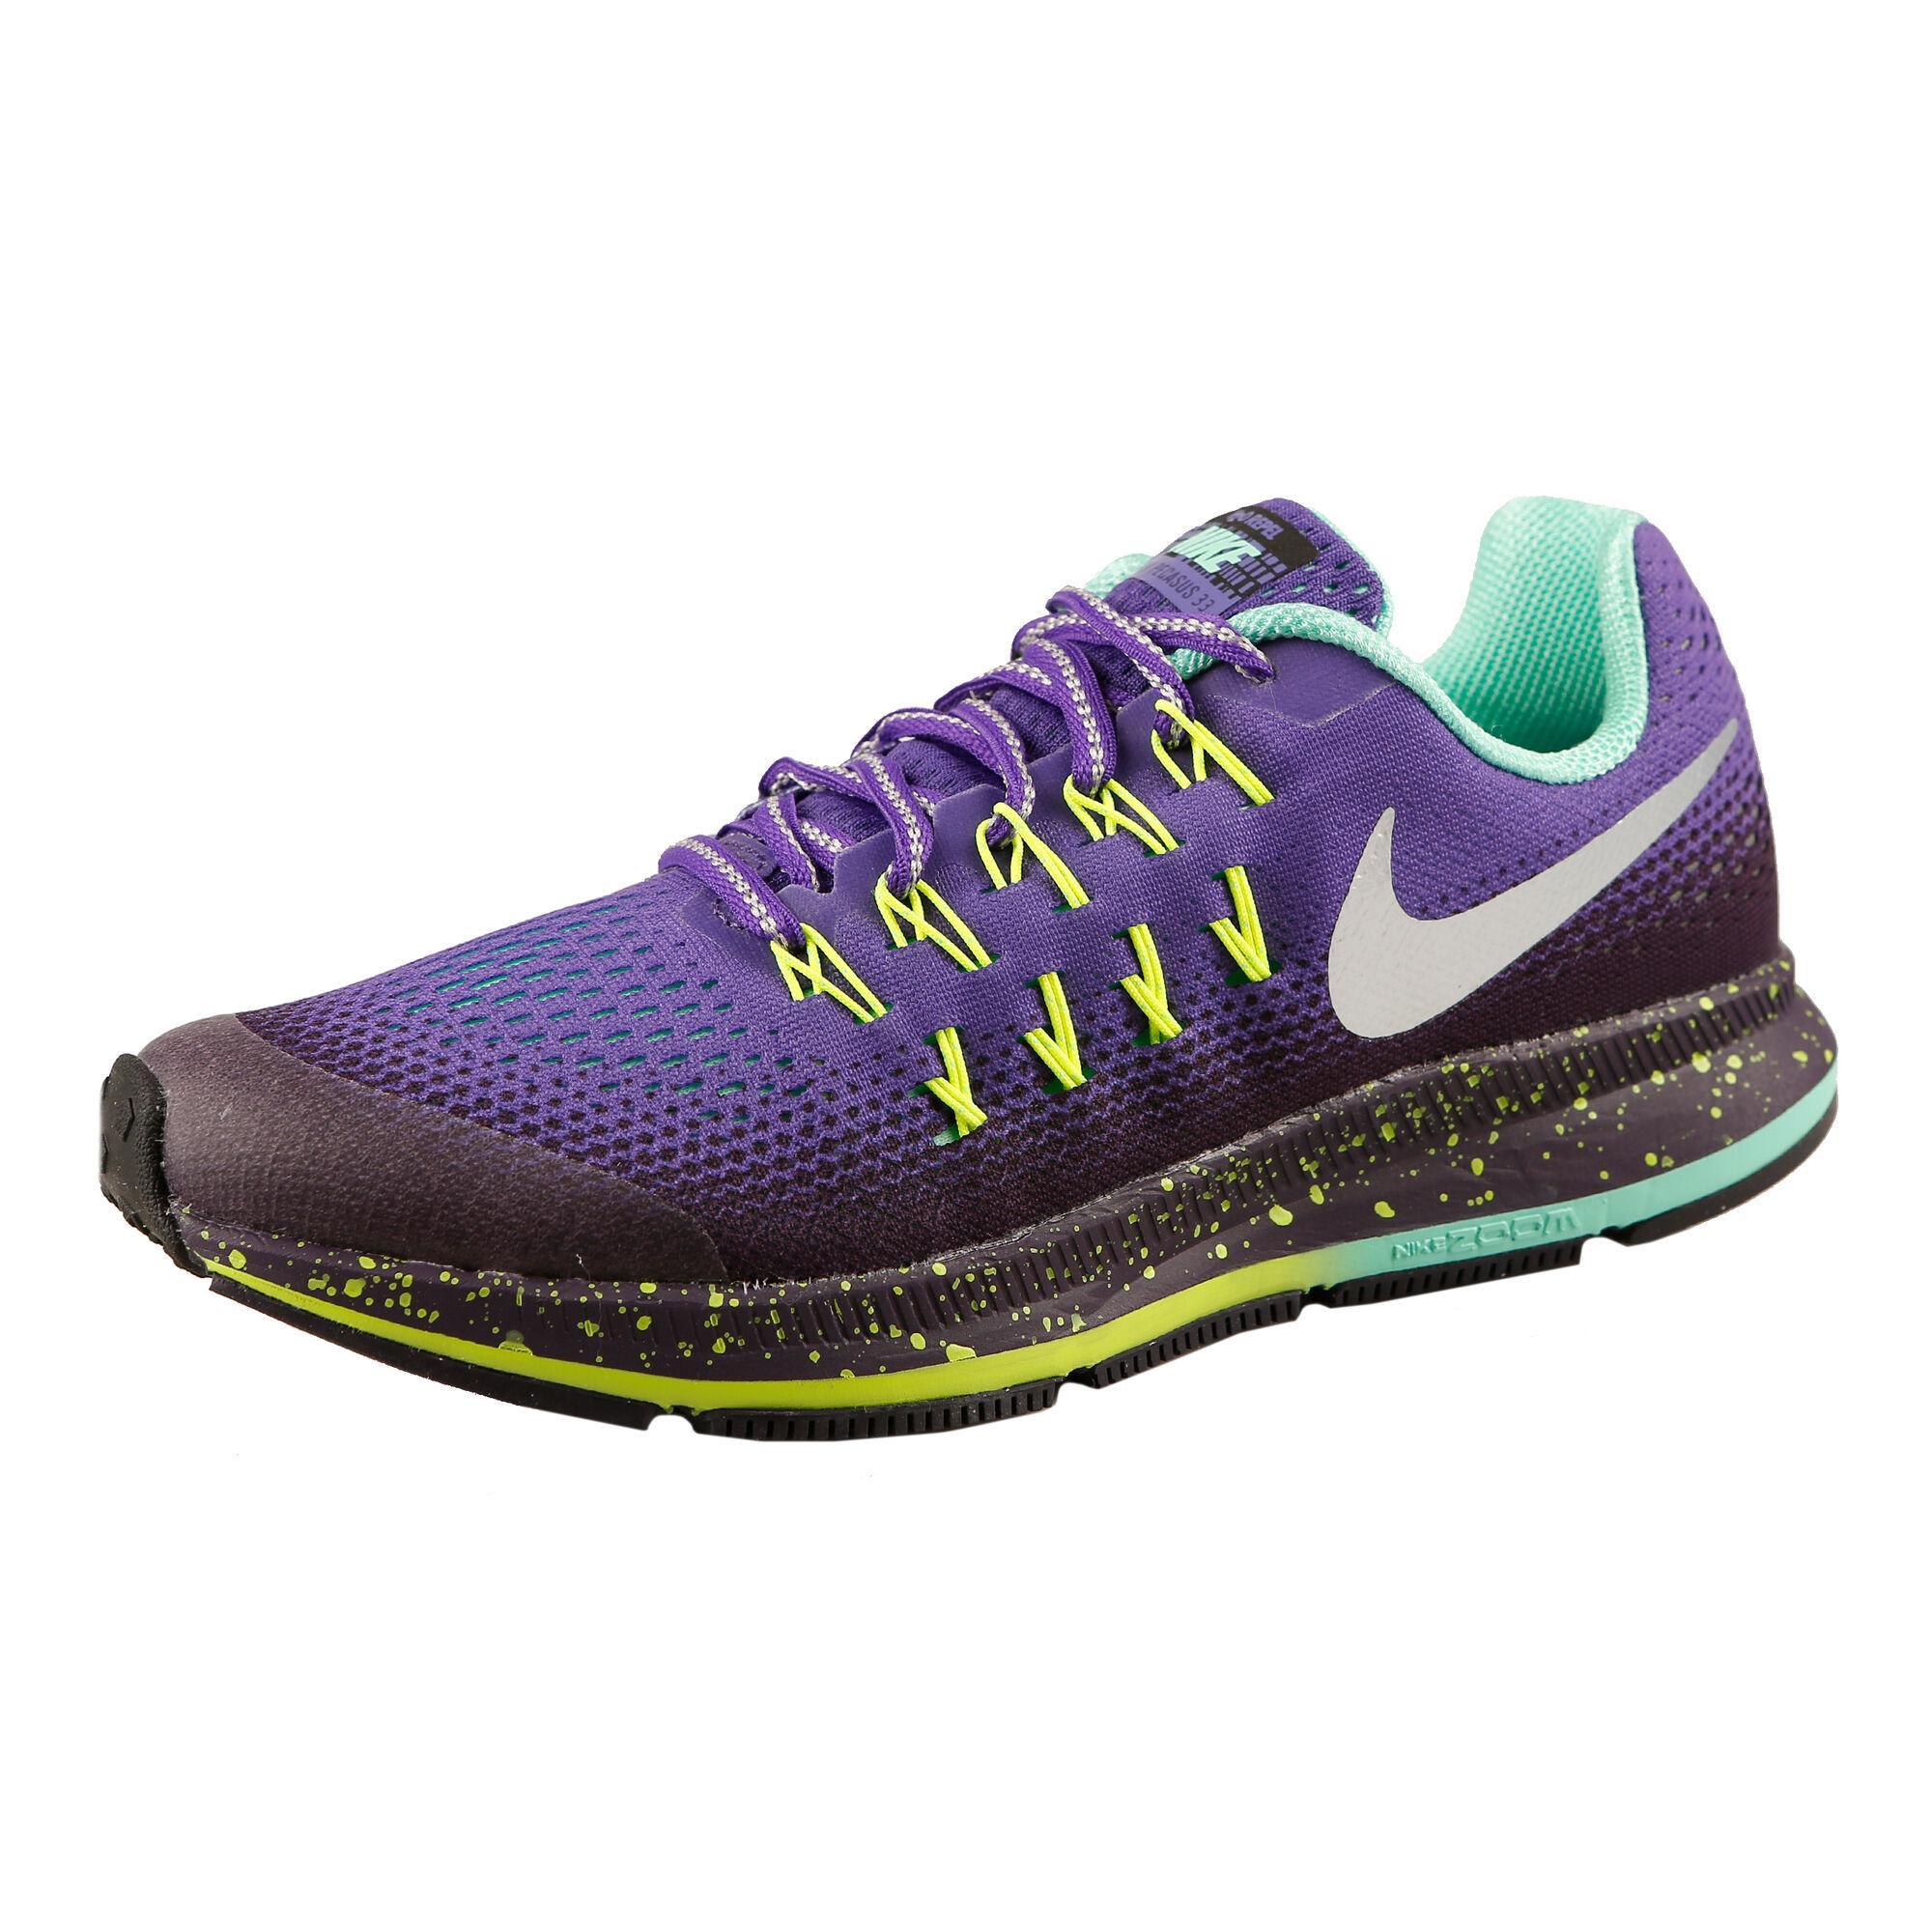 big sale 1d657 b5812 Nike Zoom Pegasus 33 Shield Neutral Running Shoe Kids - Violet, Silver